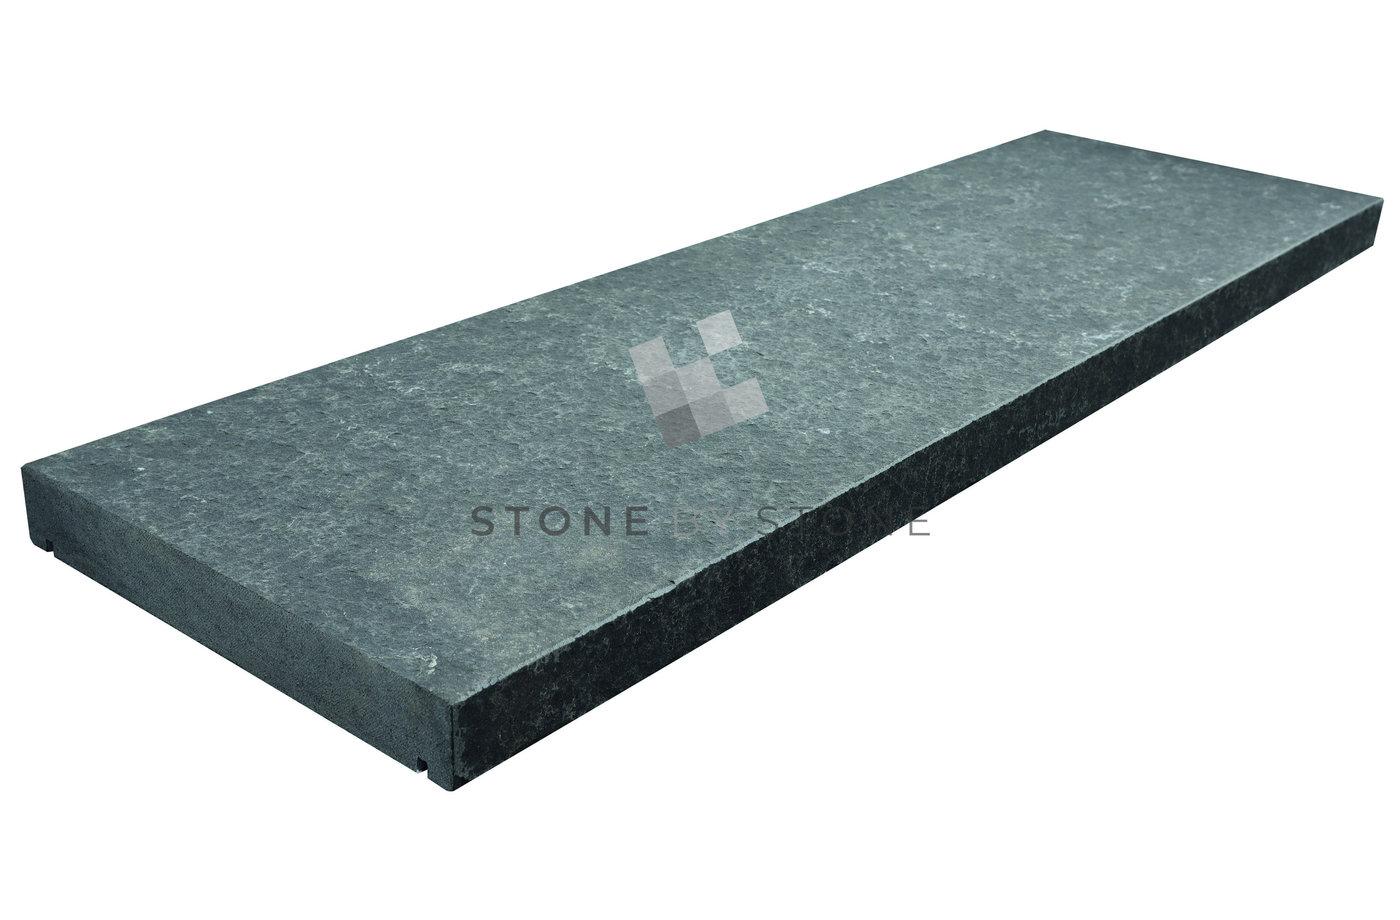 Couvertine 30x100/4cm - Basalte - Noir